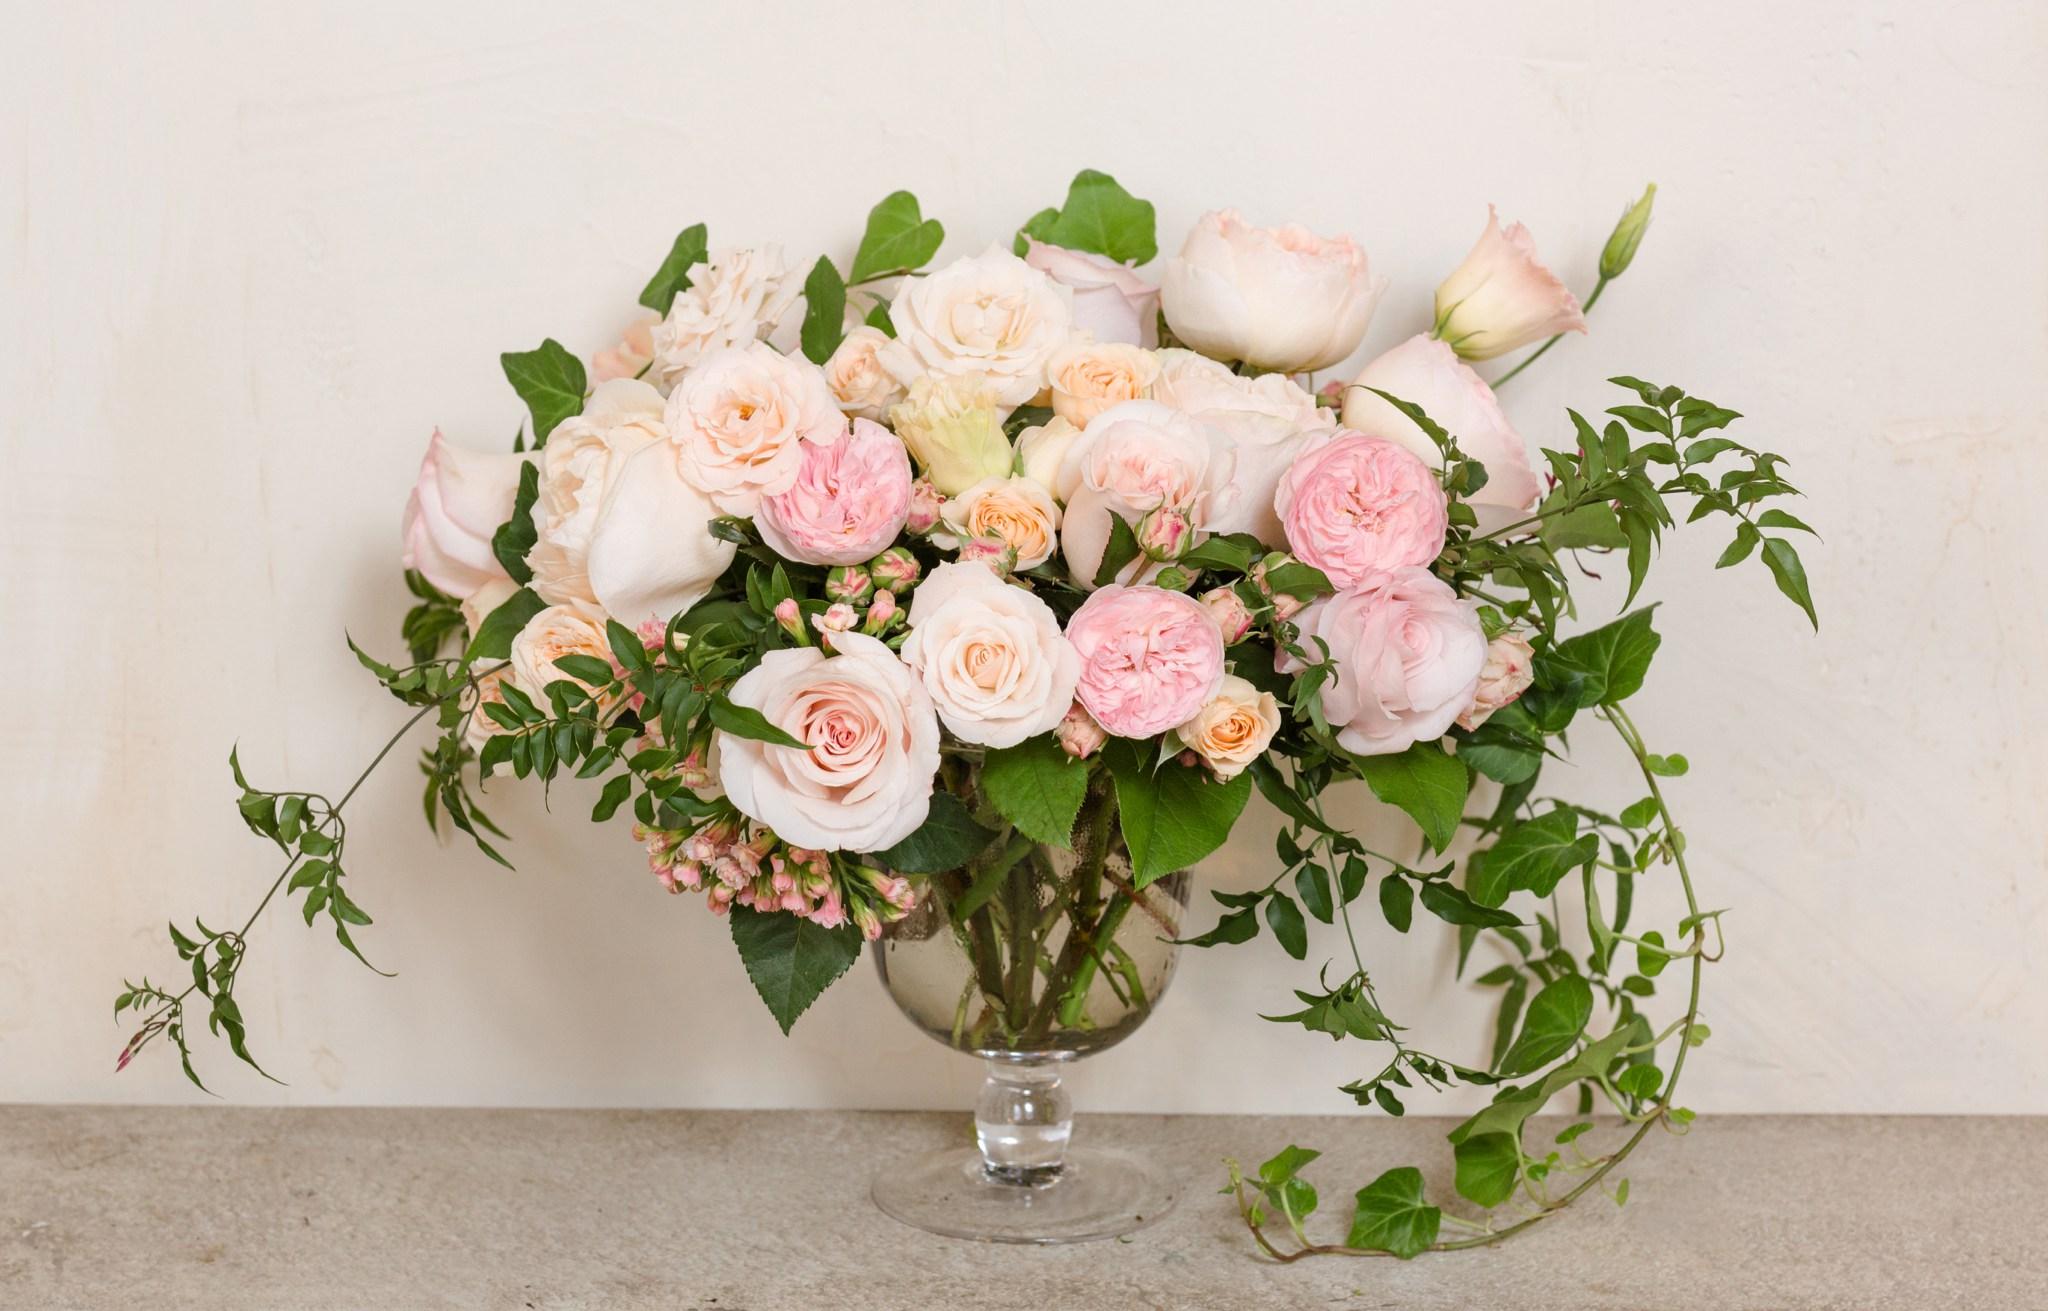 deborah_zoe_photography_best_of_flowers_2016_00039.JPG